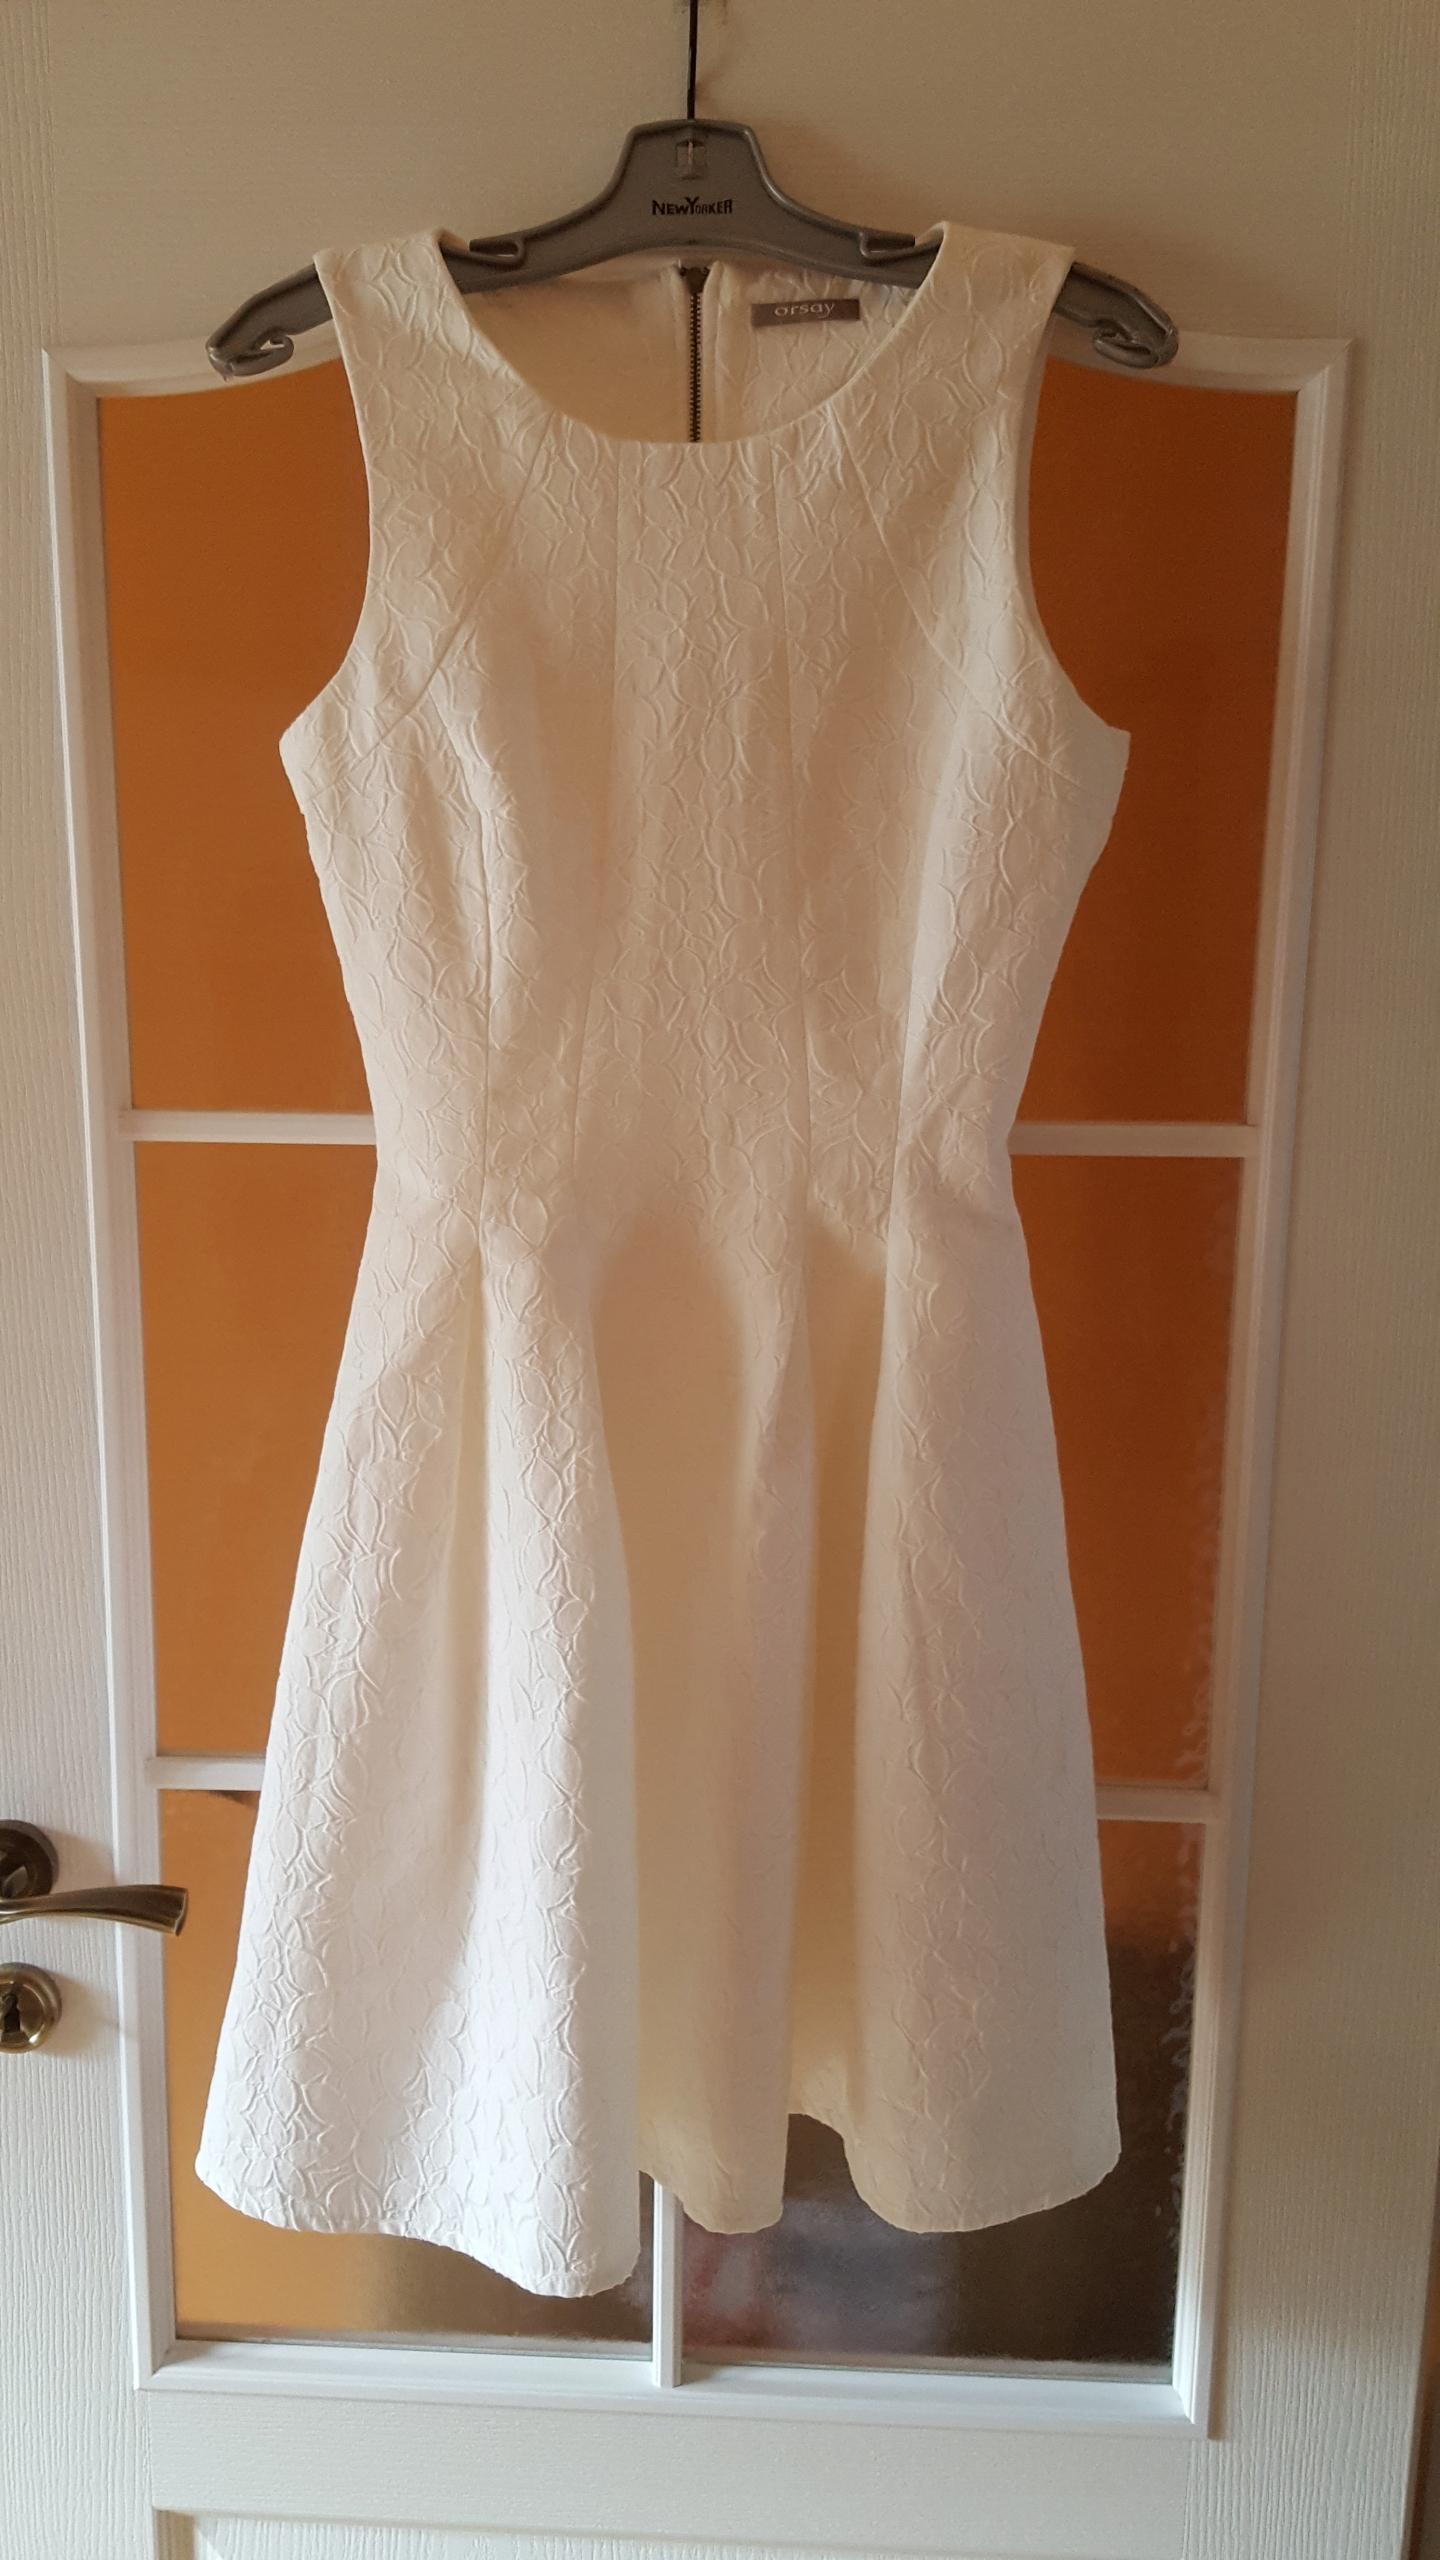 ORSAY sukienka ŚLUB wesele KREM żakard 36